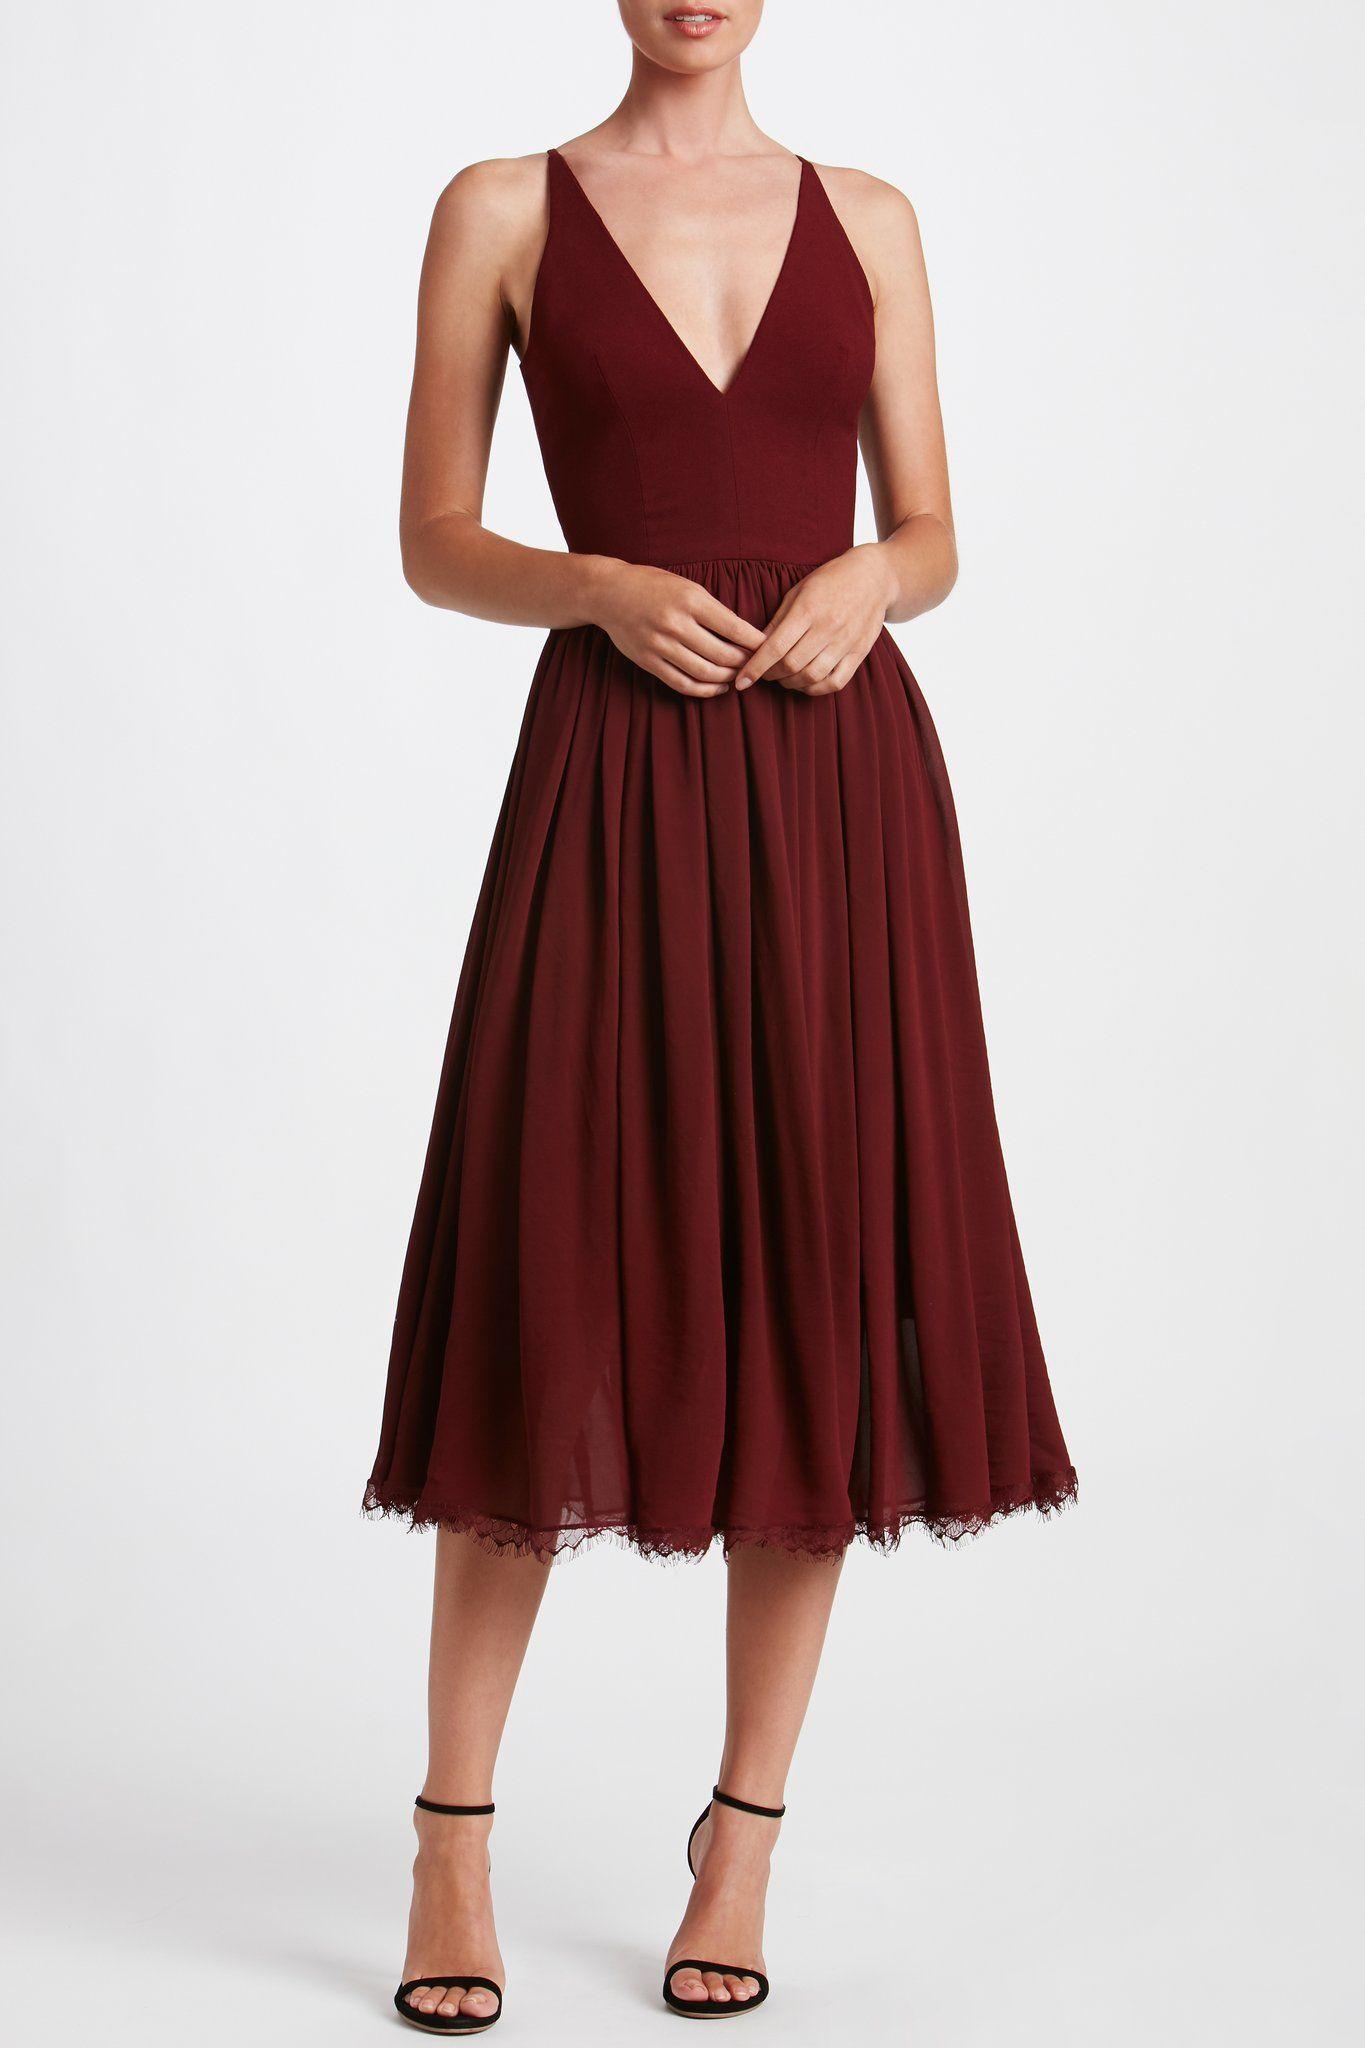 0b17892787b2 Alicia Midi Dress in 2019   Wedding dress   Burgundy midi dress ...